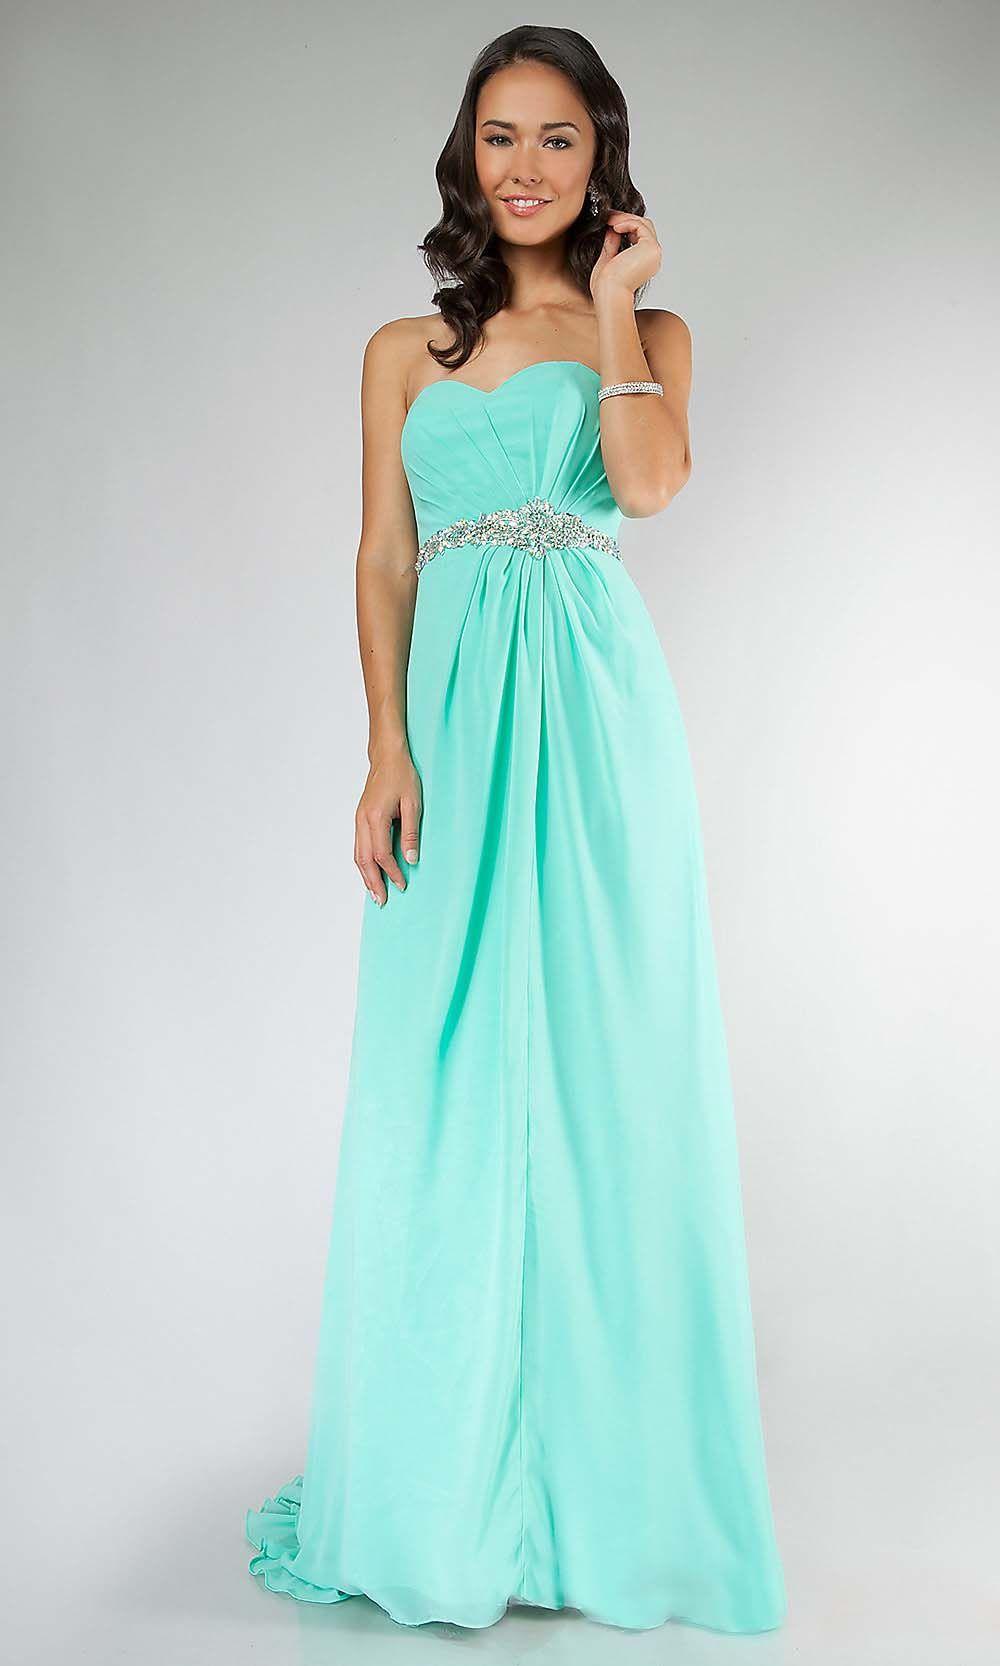 mint prom dresses, long prom dress, simple prom dresses, mint bridesmaid  dresses, · Promfeest Jurk LangPromtoga'sFormele Jurken AvondjurkenOutfitsDansen